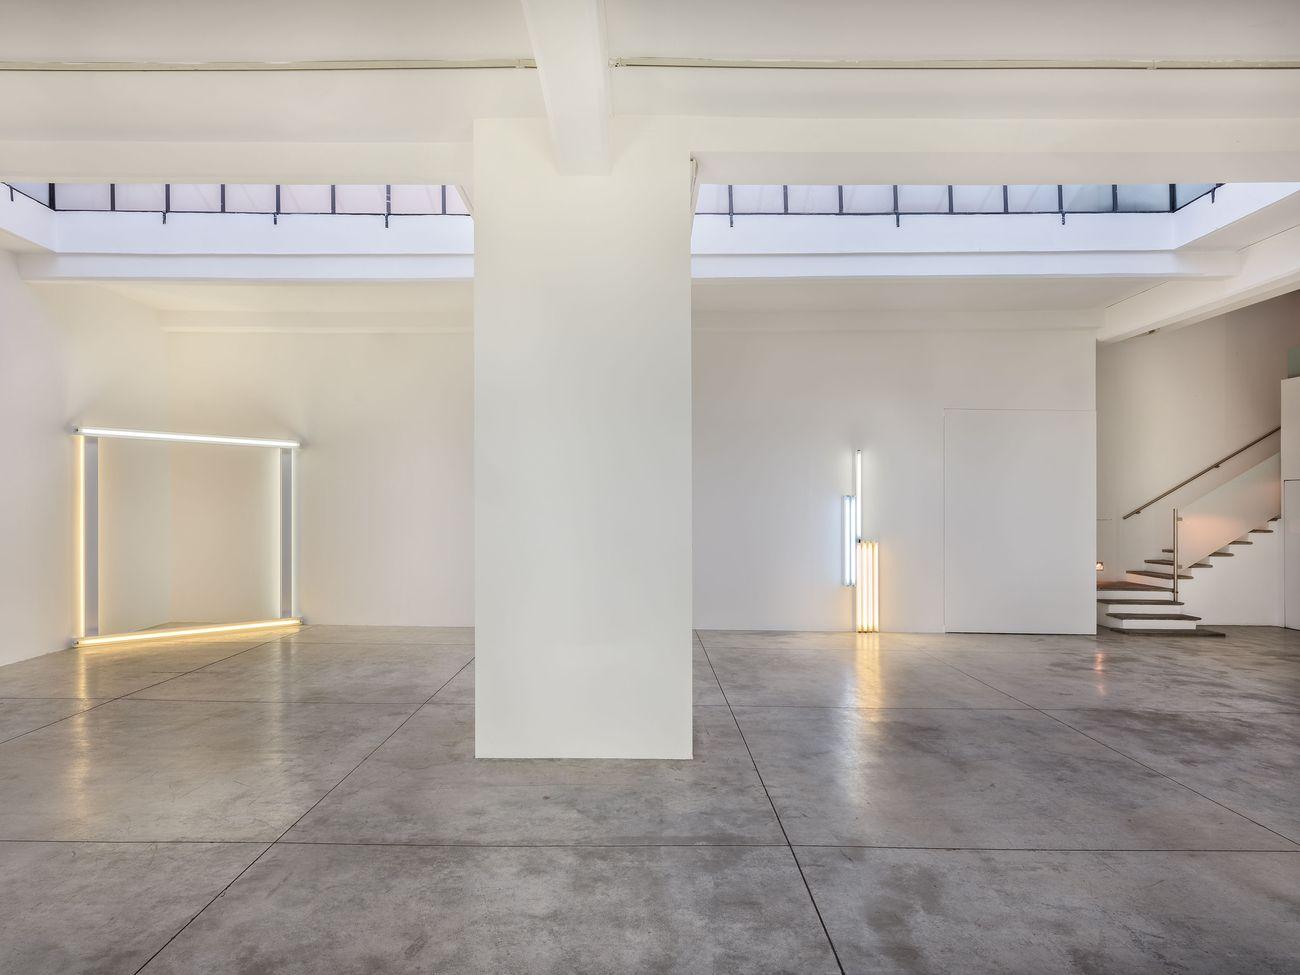 Dan Flavin. Installation view at Cardi Gallery, Milano 2019 © 2018 Estate of Dan Flavin _ Artists Rights Society (ARS), New York. Courtesy Cardi Gallery, Milano Londra. Photo credits Carlo Vannini